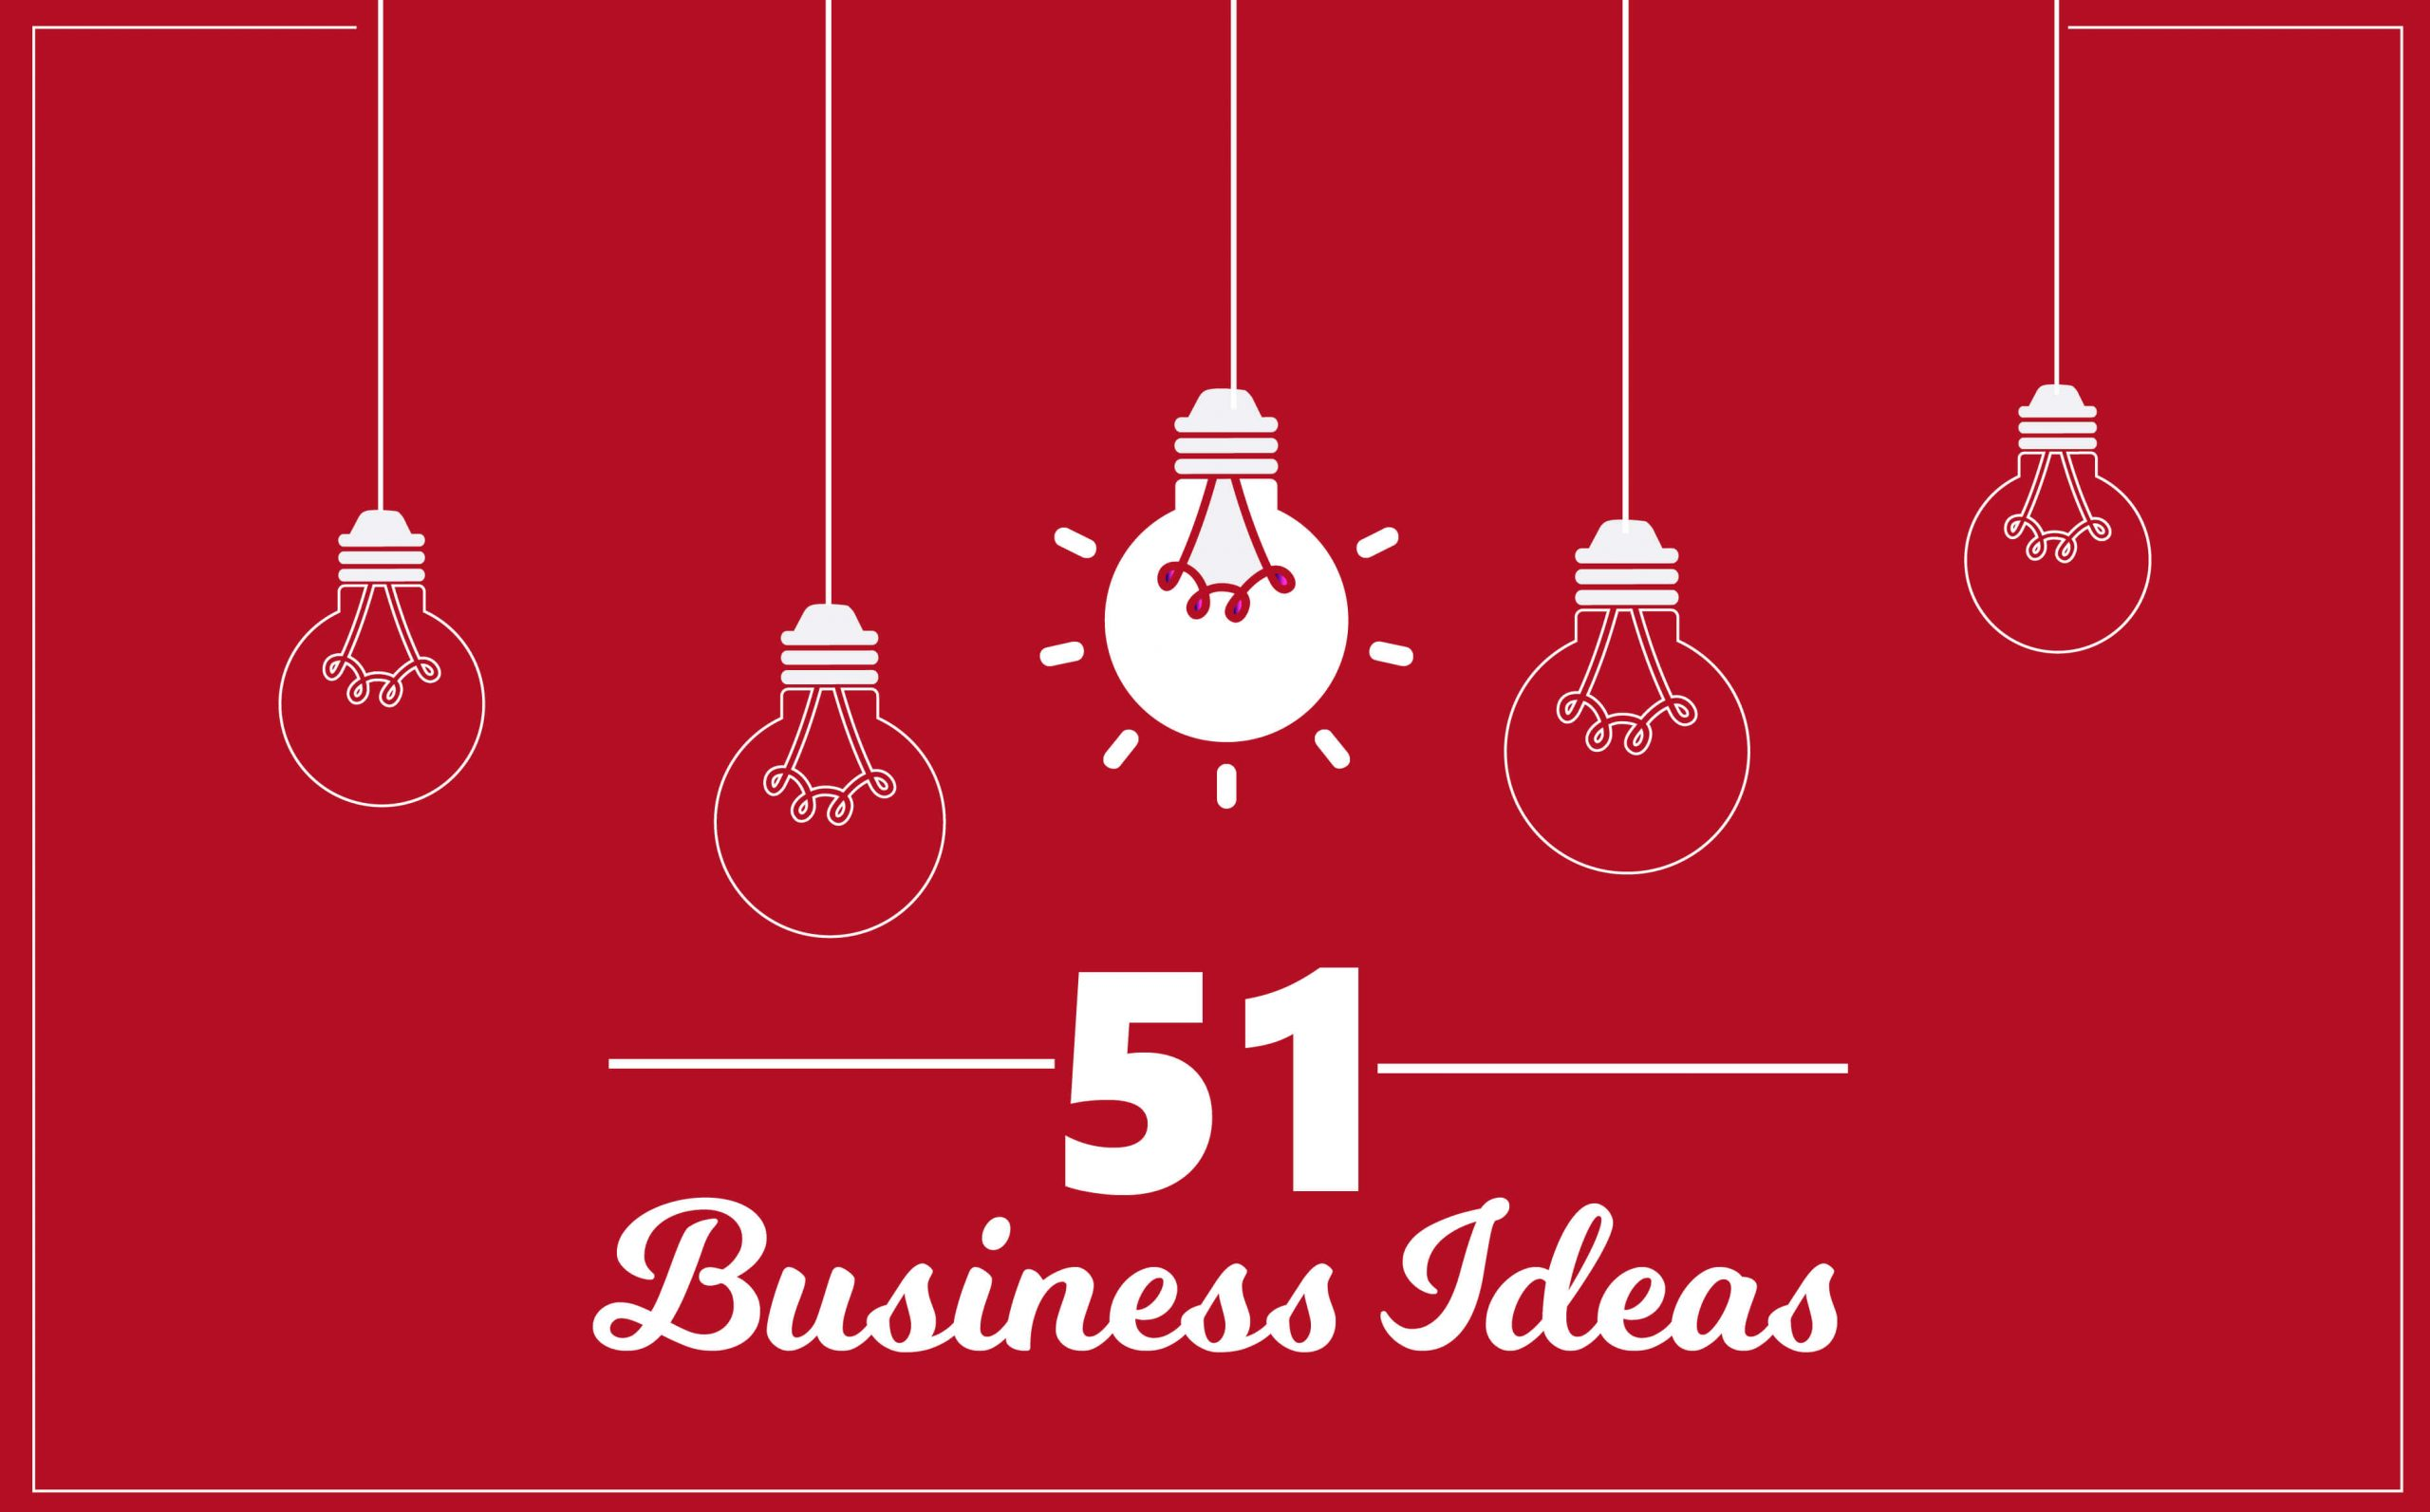 Business Ideas | The Money Gig